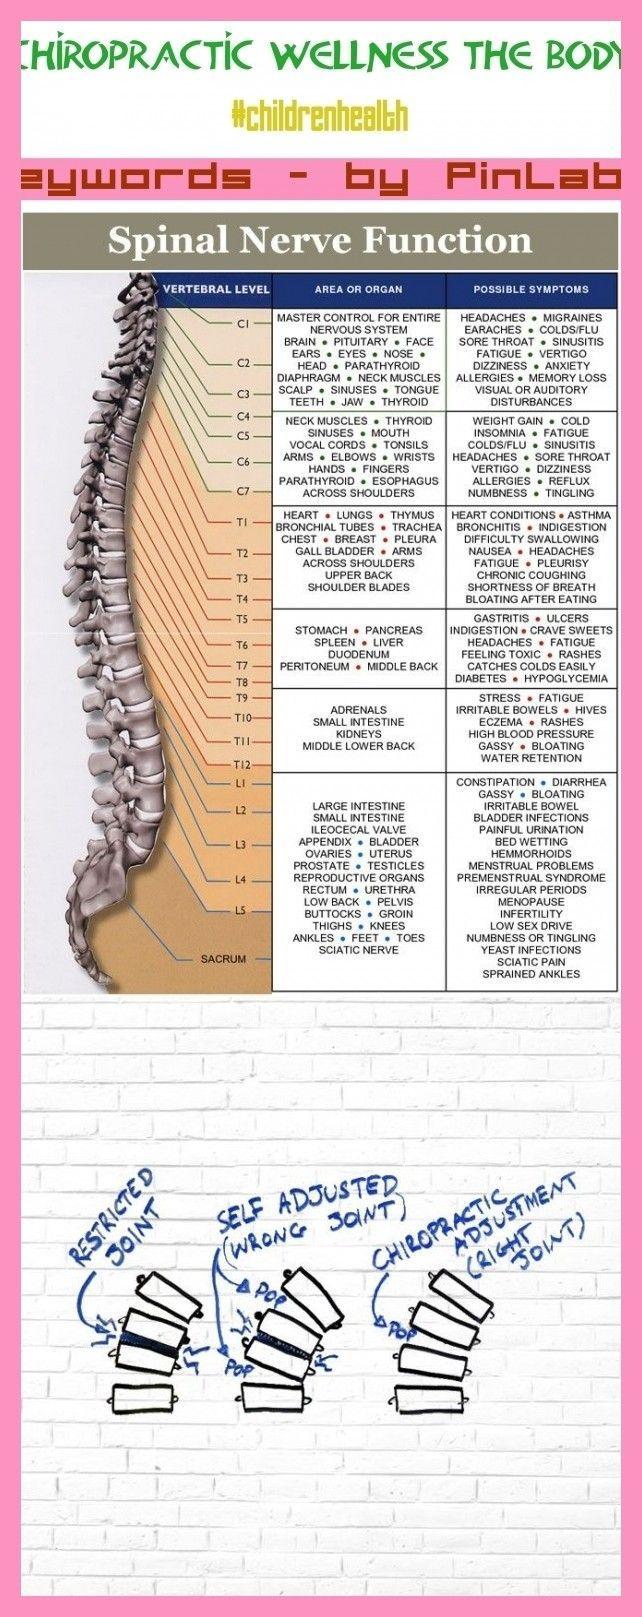 Chiropractic wellness the body chi  Chiropractic wellness the body chi  Chiropractic wellness the body chiropractic wellness health benefits chiropractic wellness qu